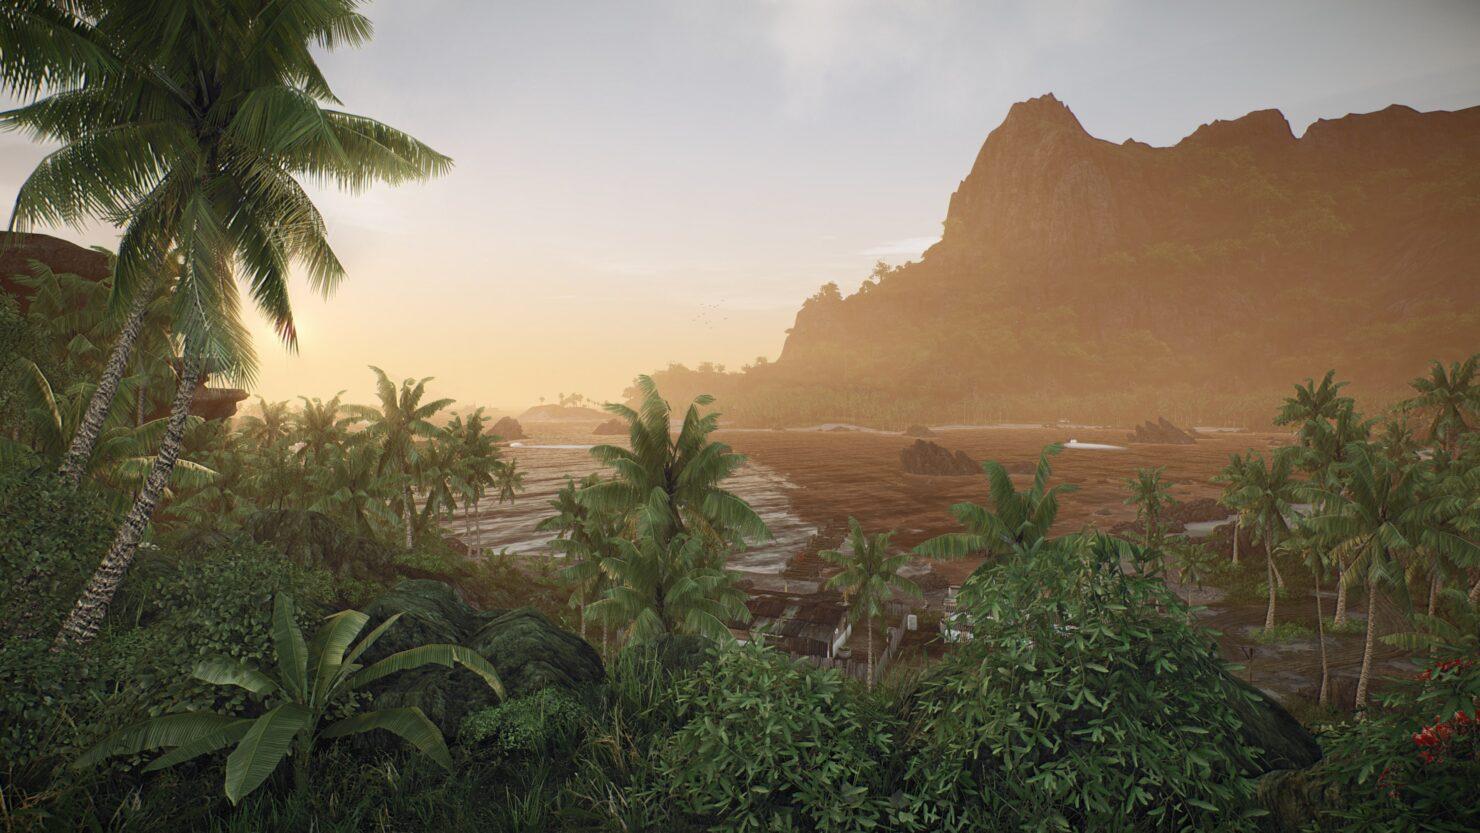 island-morning_49959505222_o